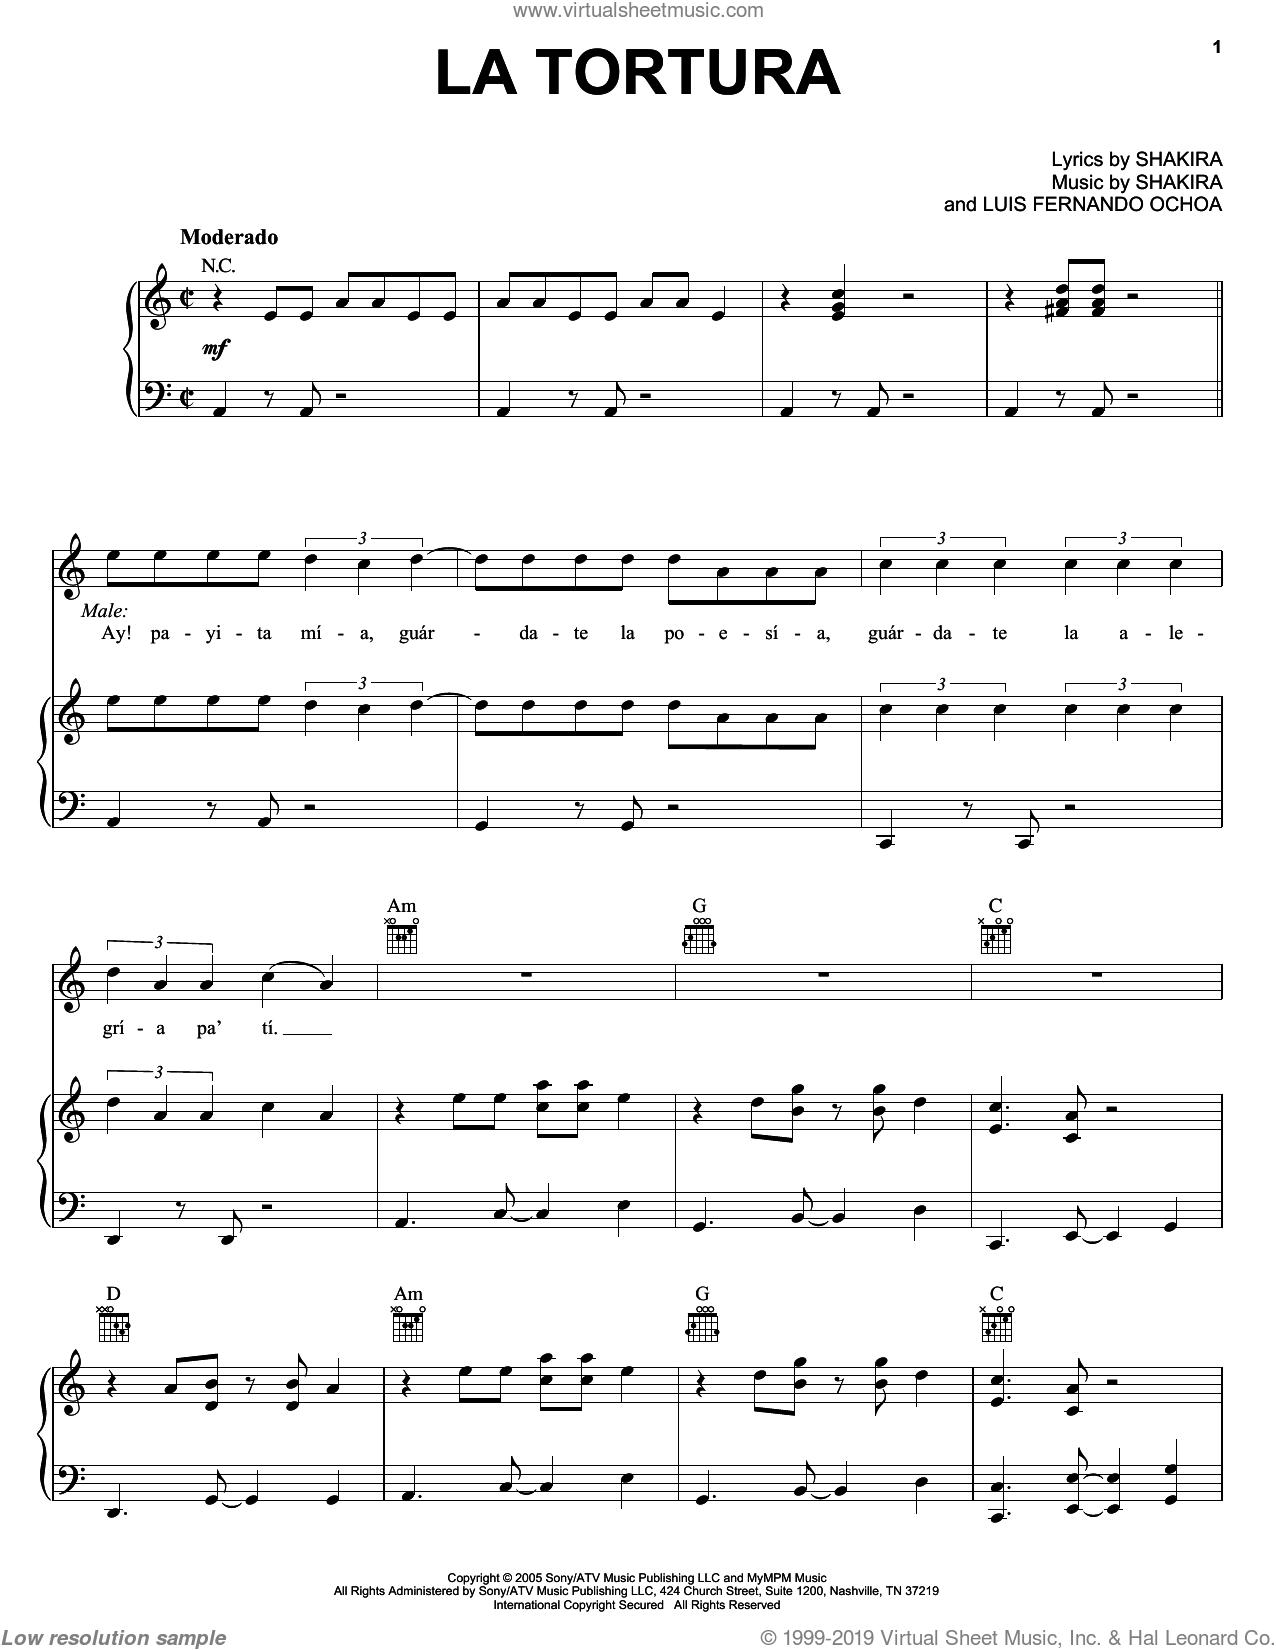 La Tortura sheet music for voice, piano or guitar by Shakira featuring Alejandro Sanz, Alejandro Sanz, Luis Fernando Ochoa and Shakira, intermediate skill level